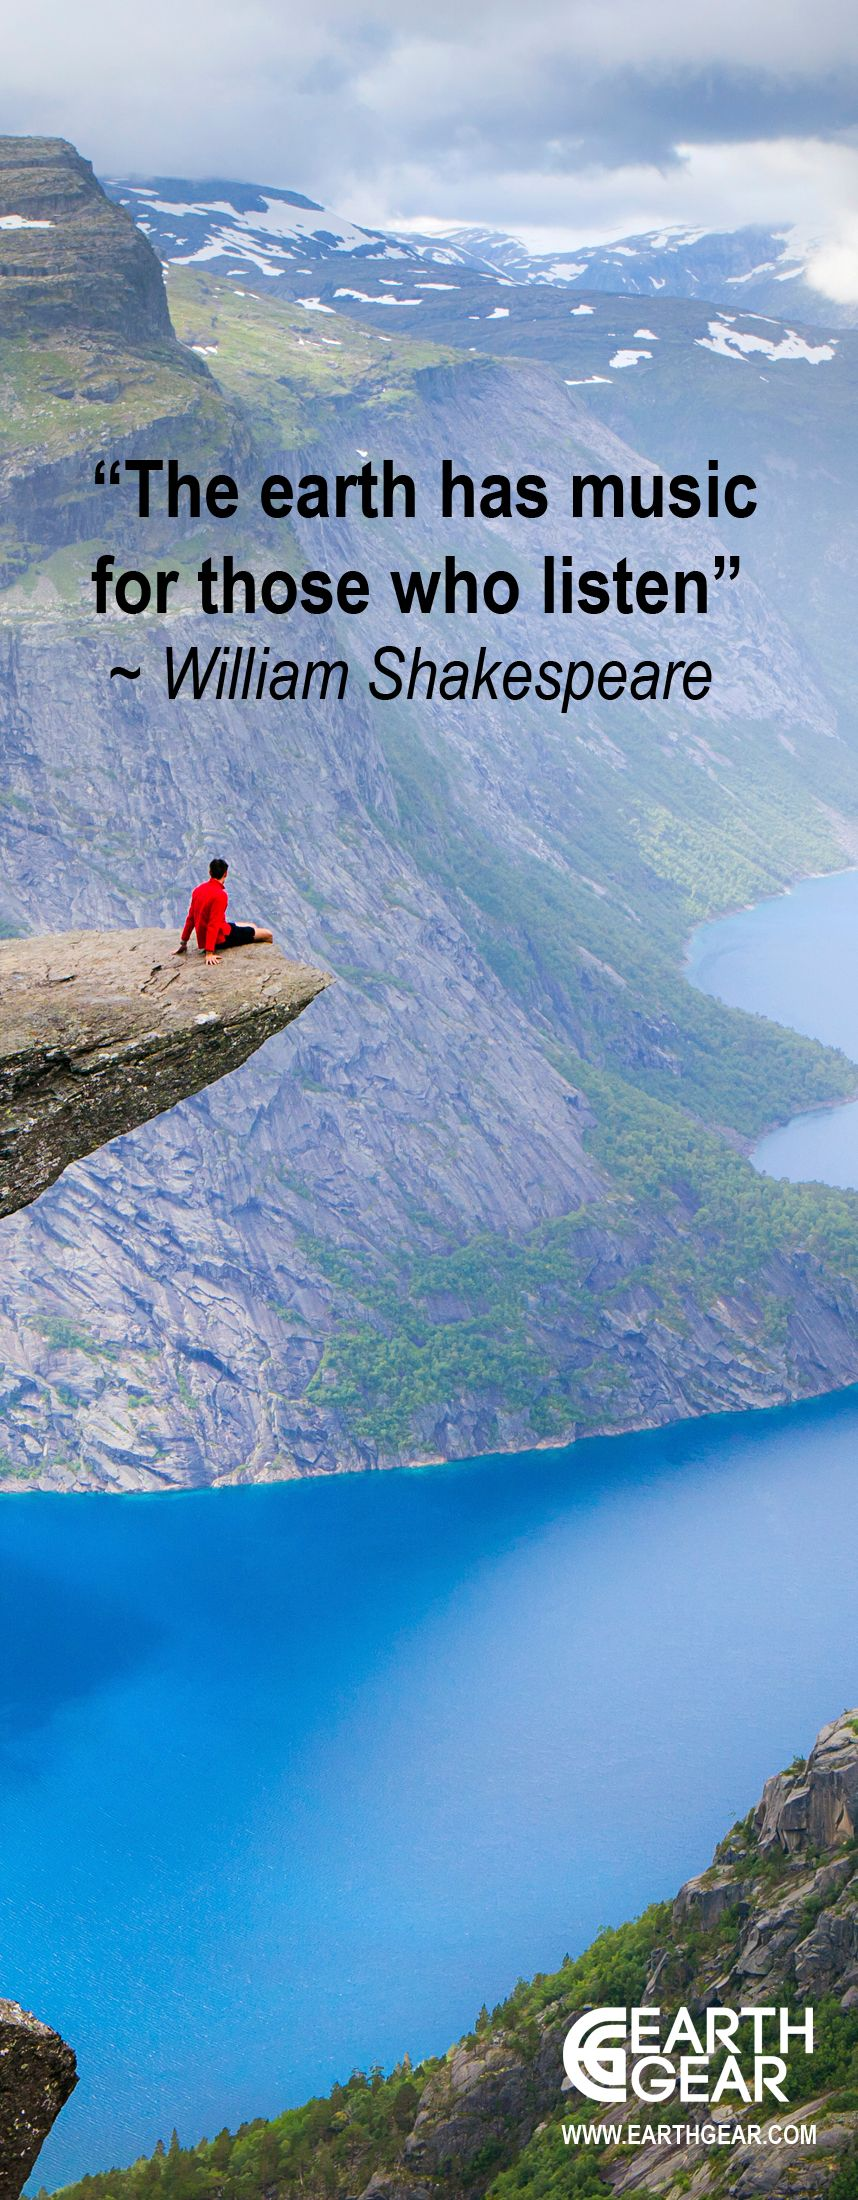 Inspirational Quotes Outdoor Adventure Landscape Quotes